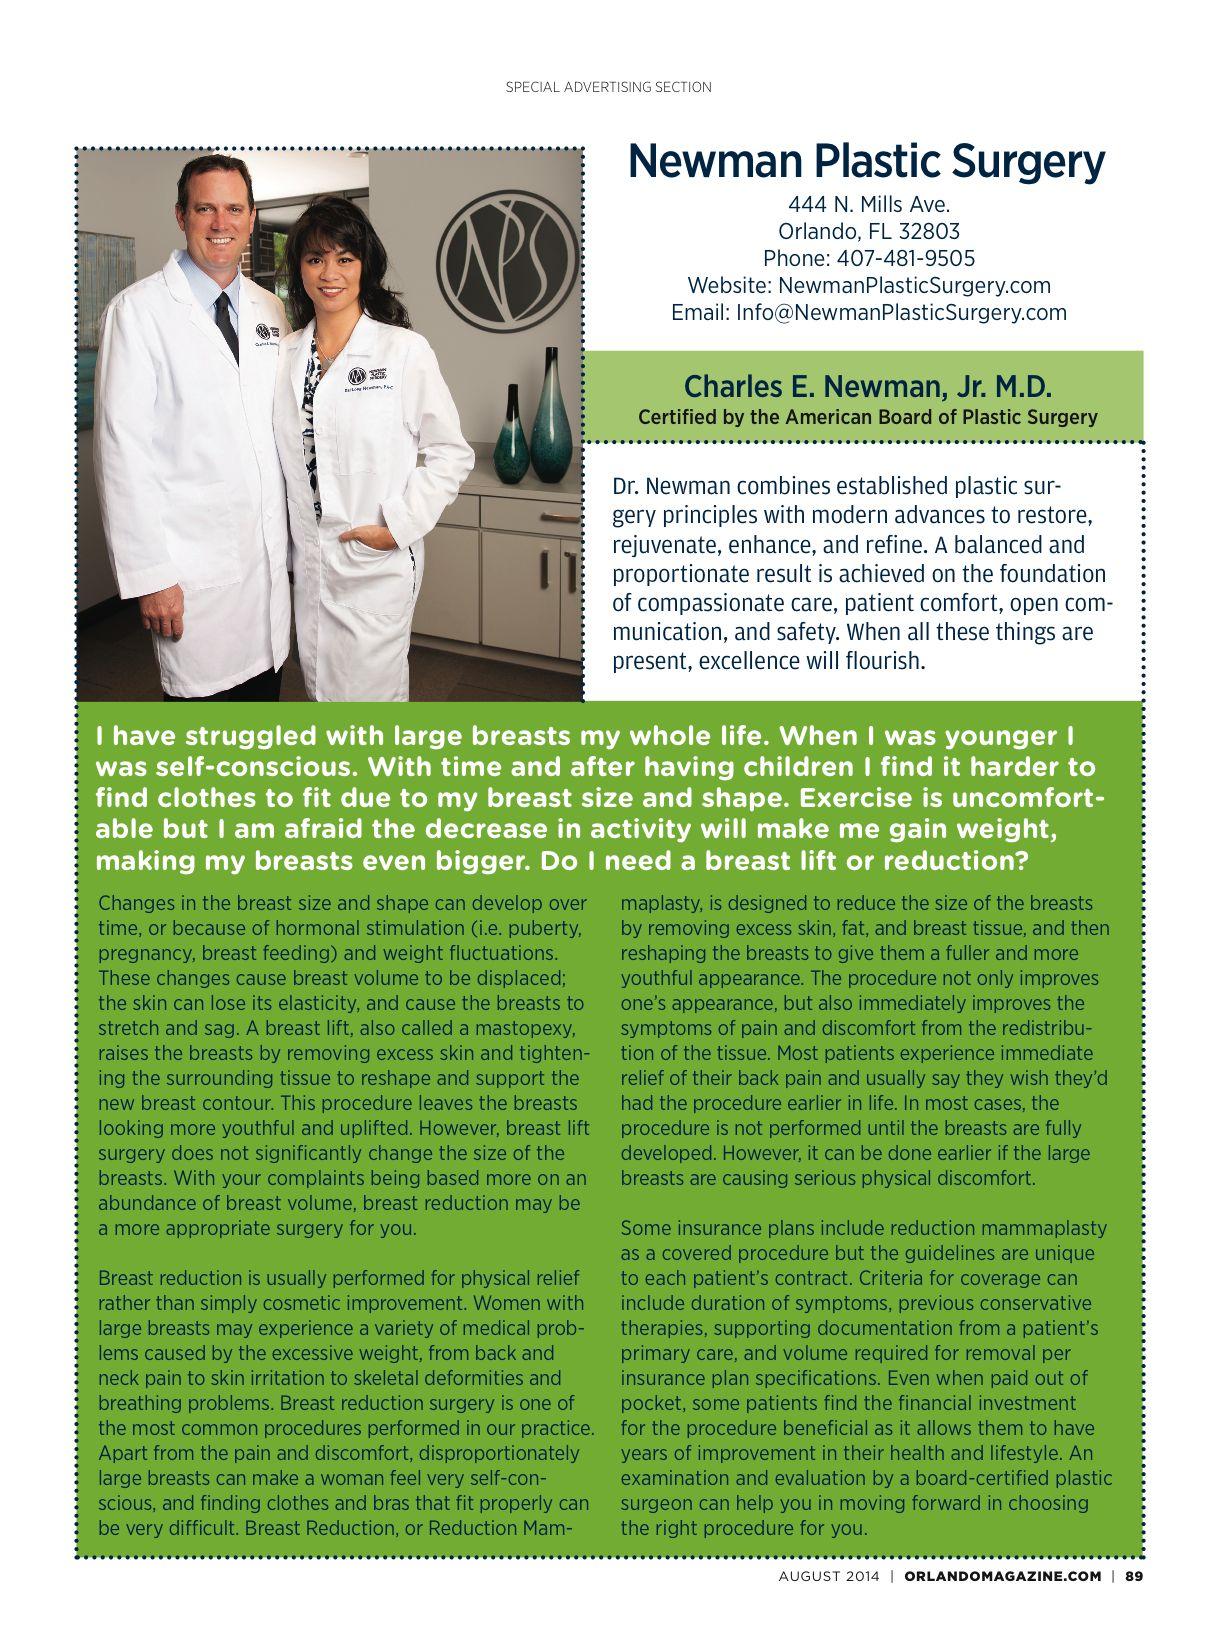 Plastic Surgeon - Newman Plastic Surgery Orlando